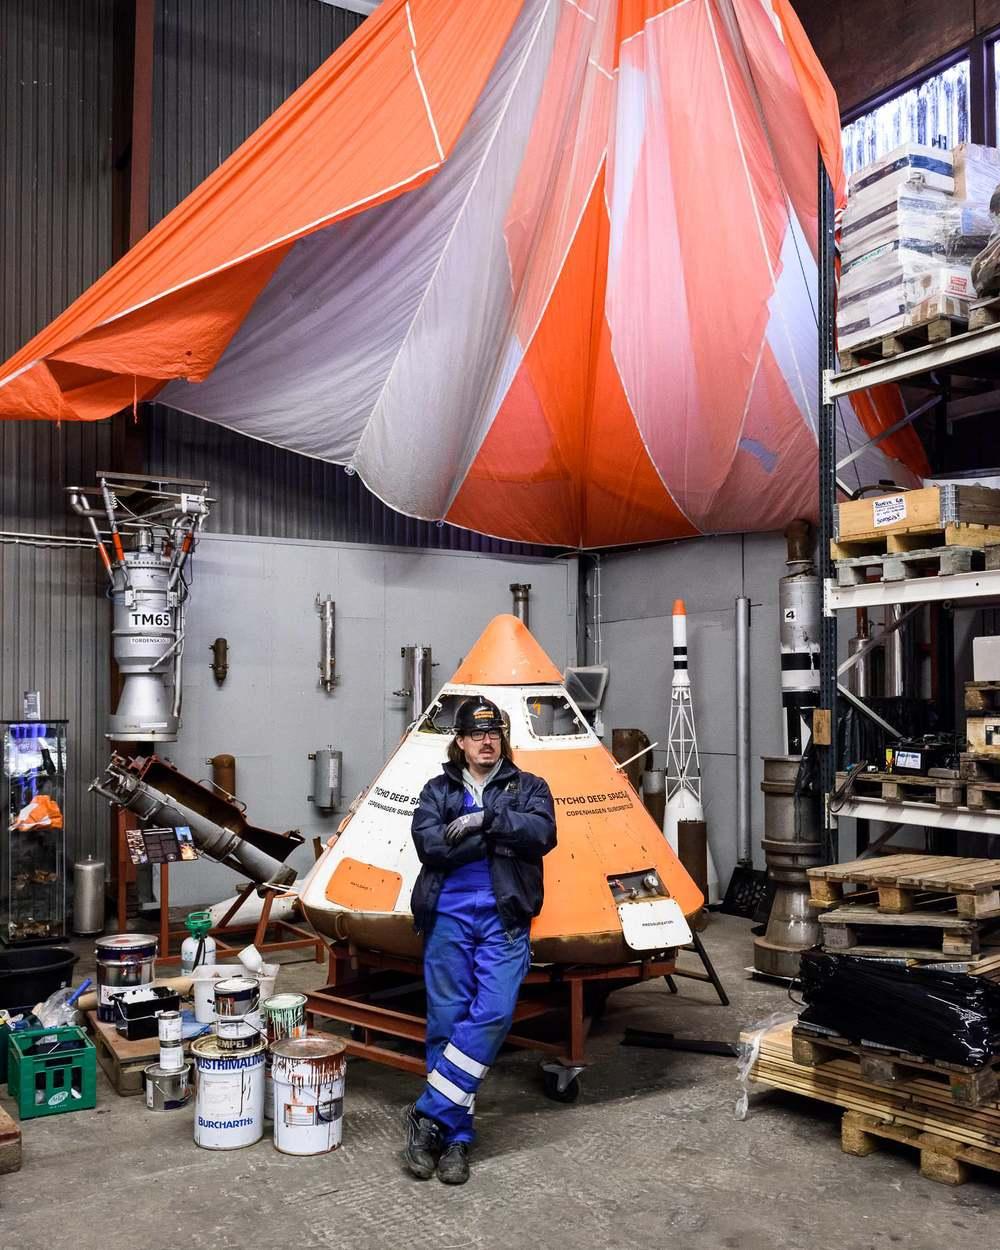 Mads Wilson of Copenhagen Suborbitals, Denmark